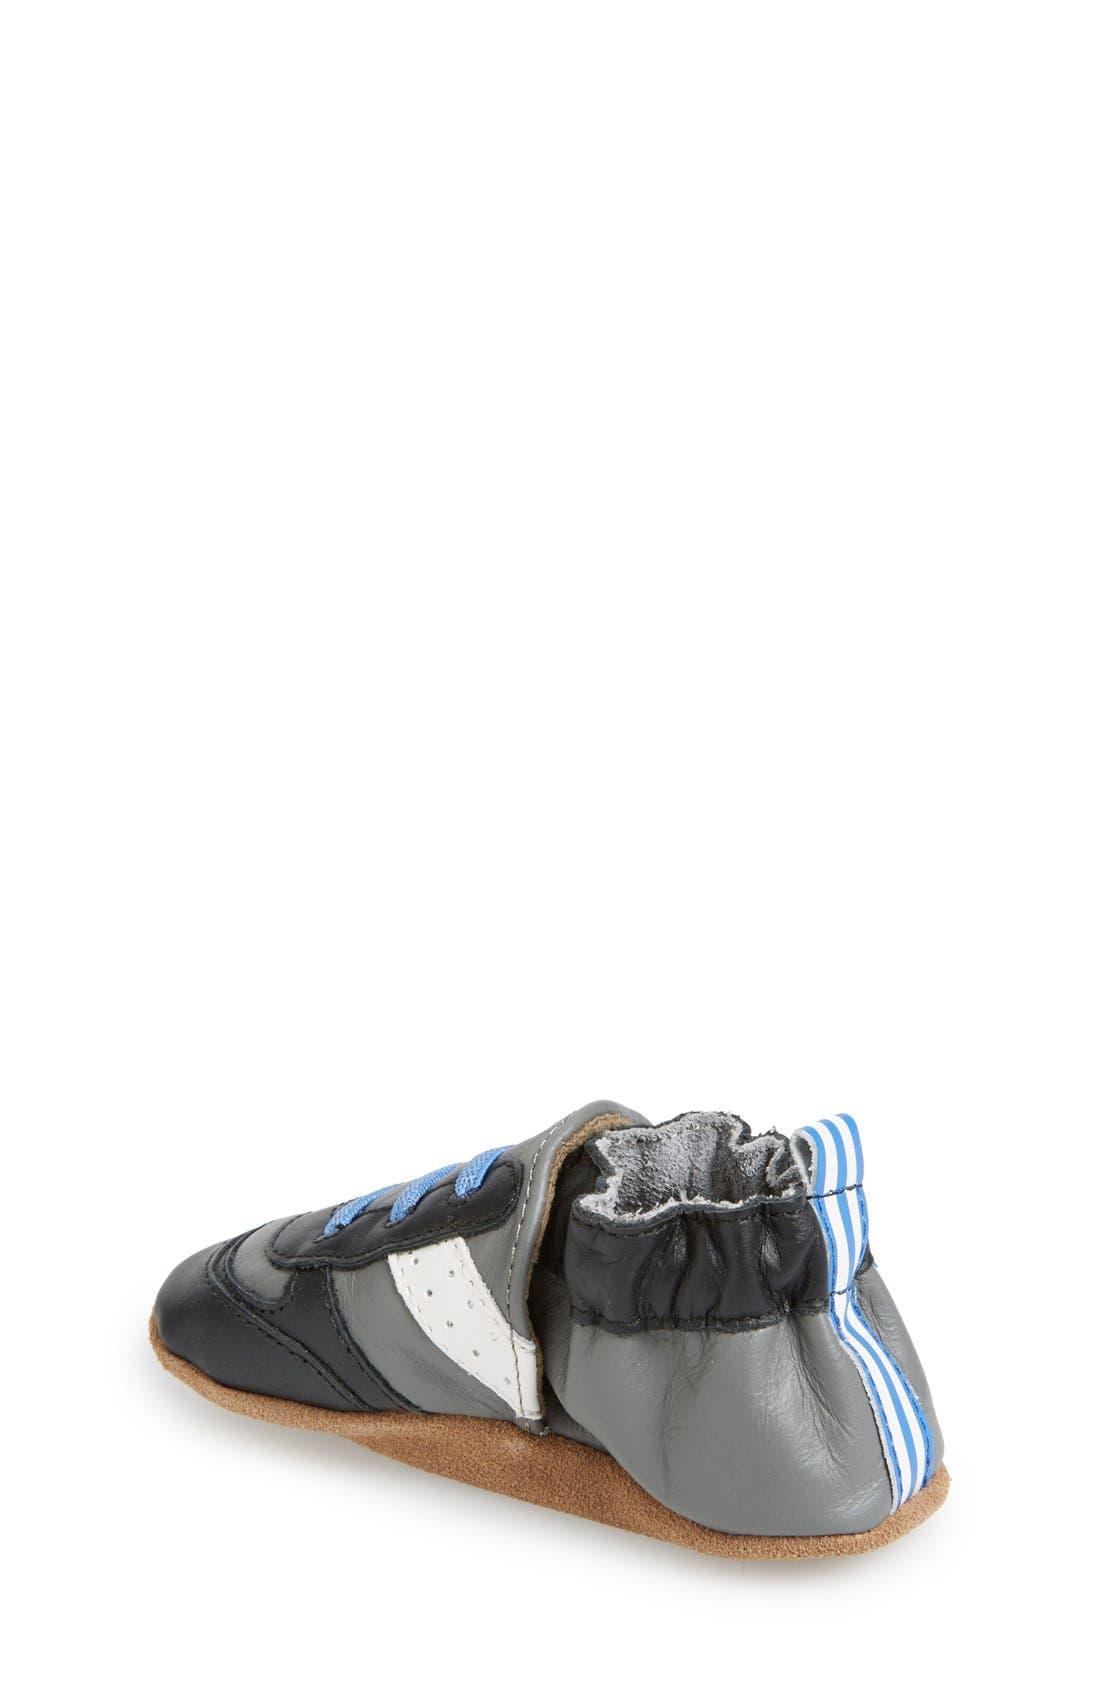 'Super Sporty' Crib Shoe,                             Main thumbnail 1, color,                             020